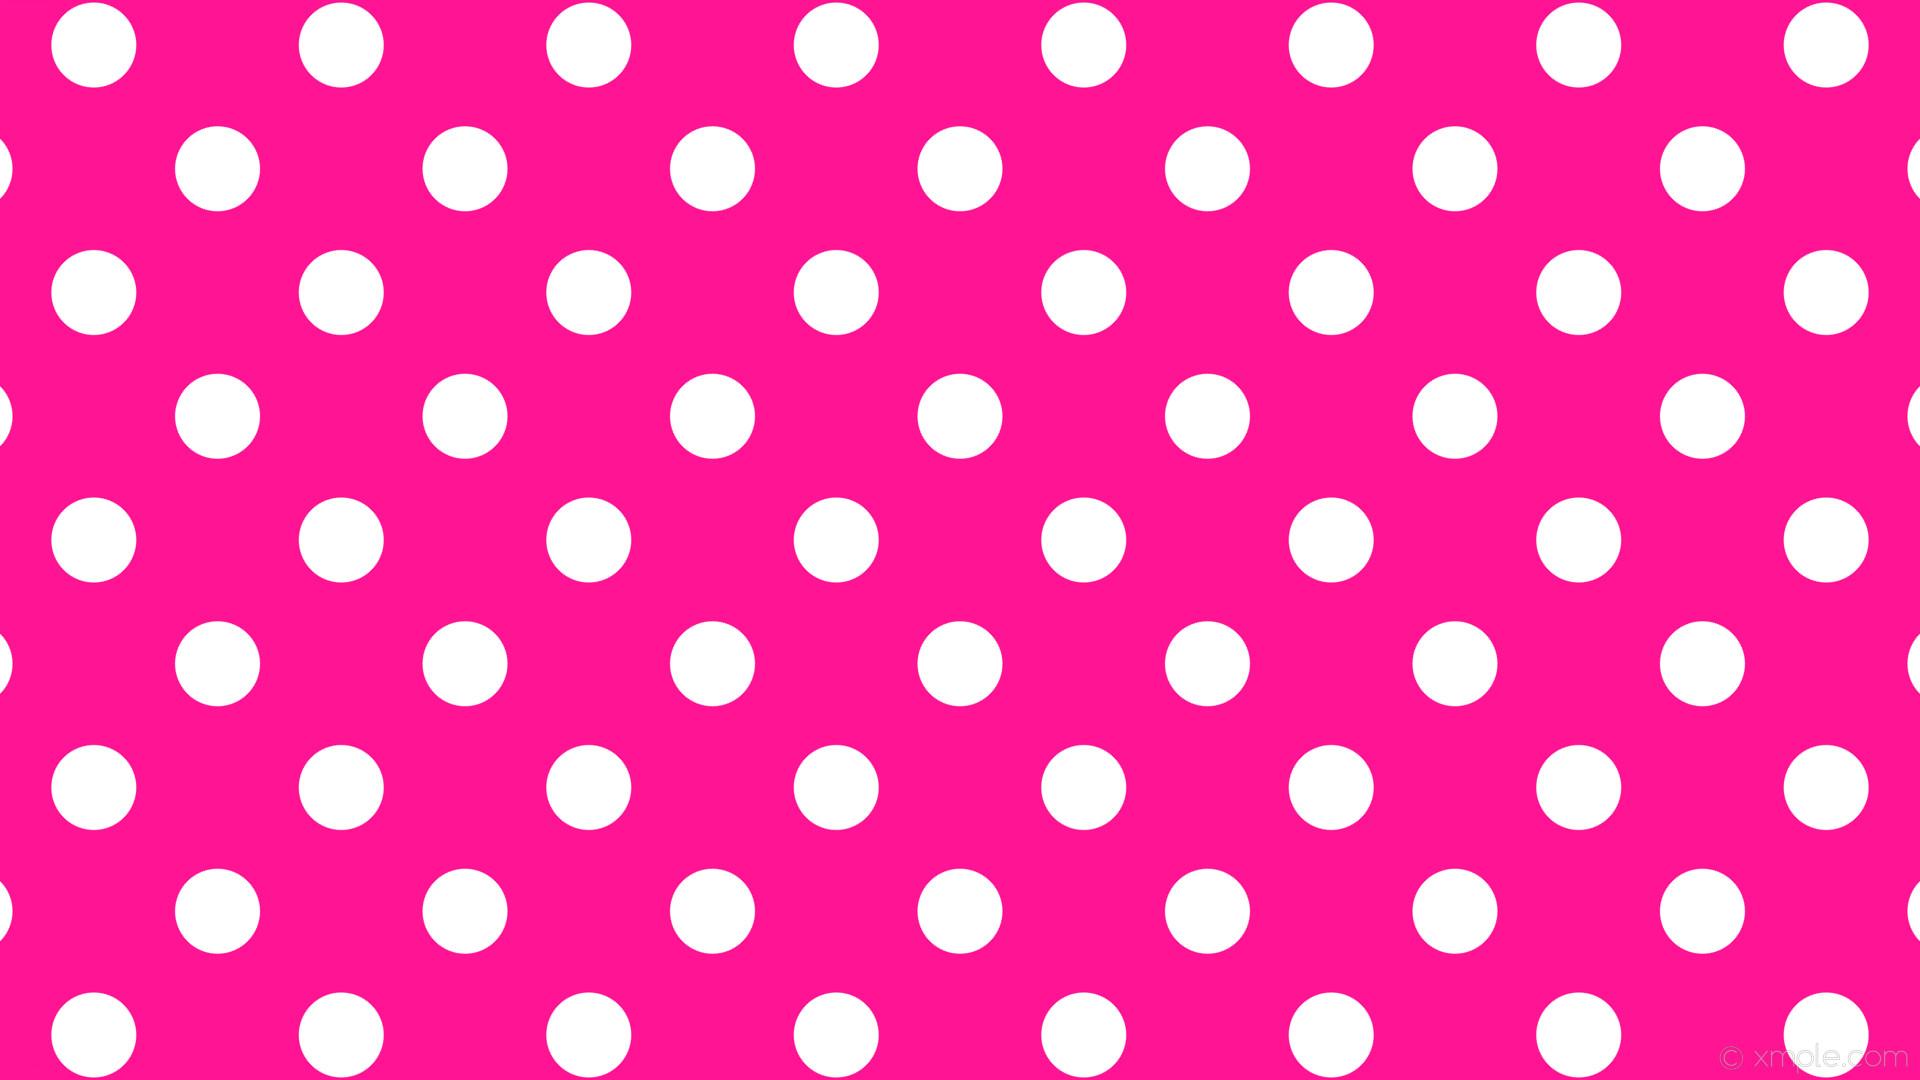 wallpaper polka spots pink white dots deep pink #ff1493 #ffffff 225° 85px  175px